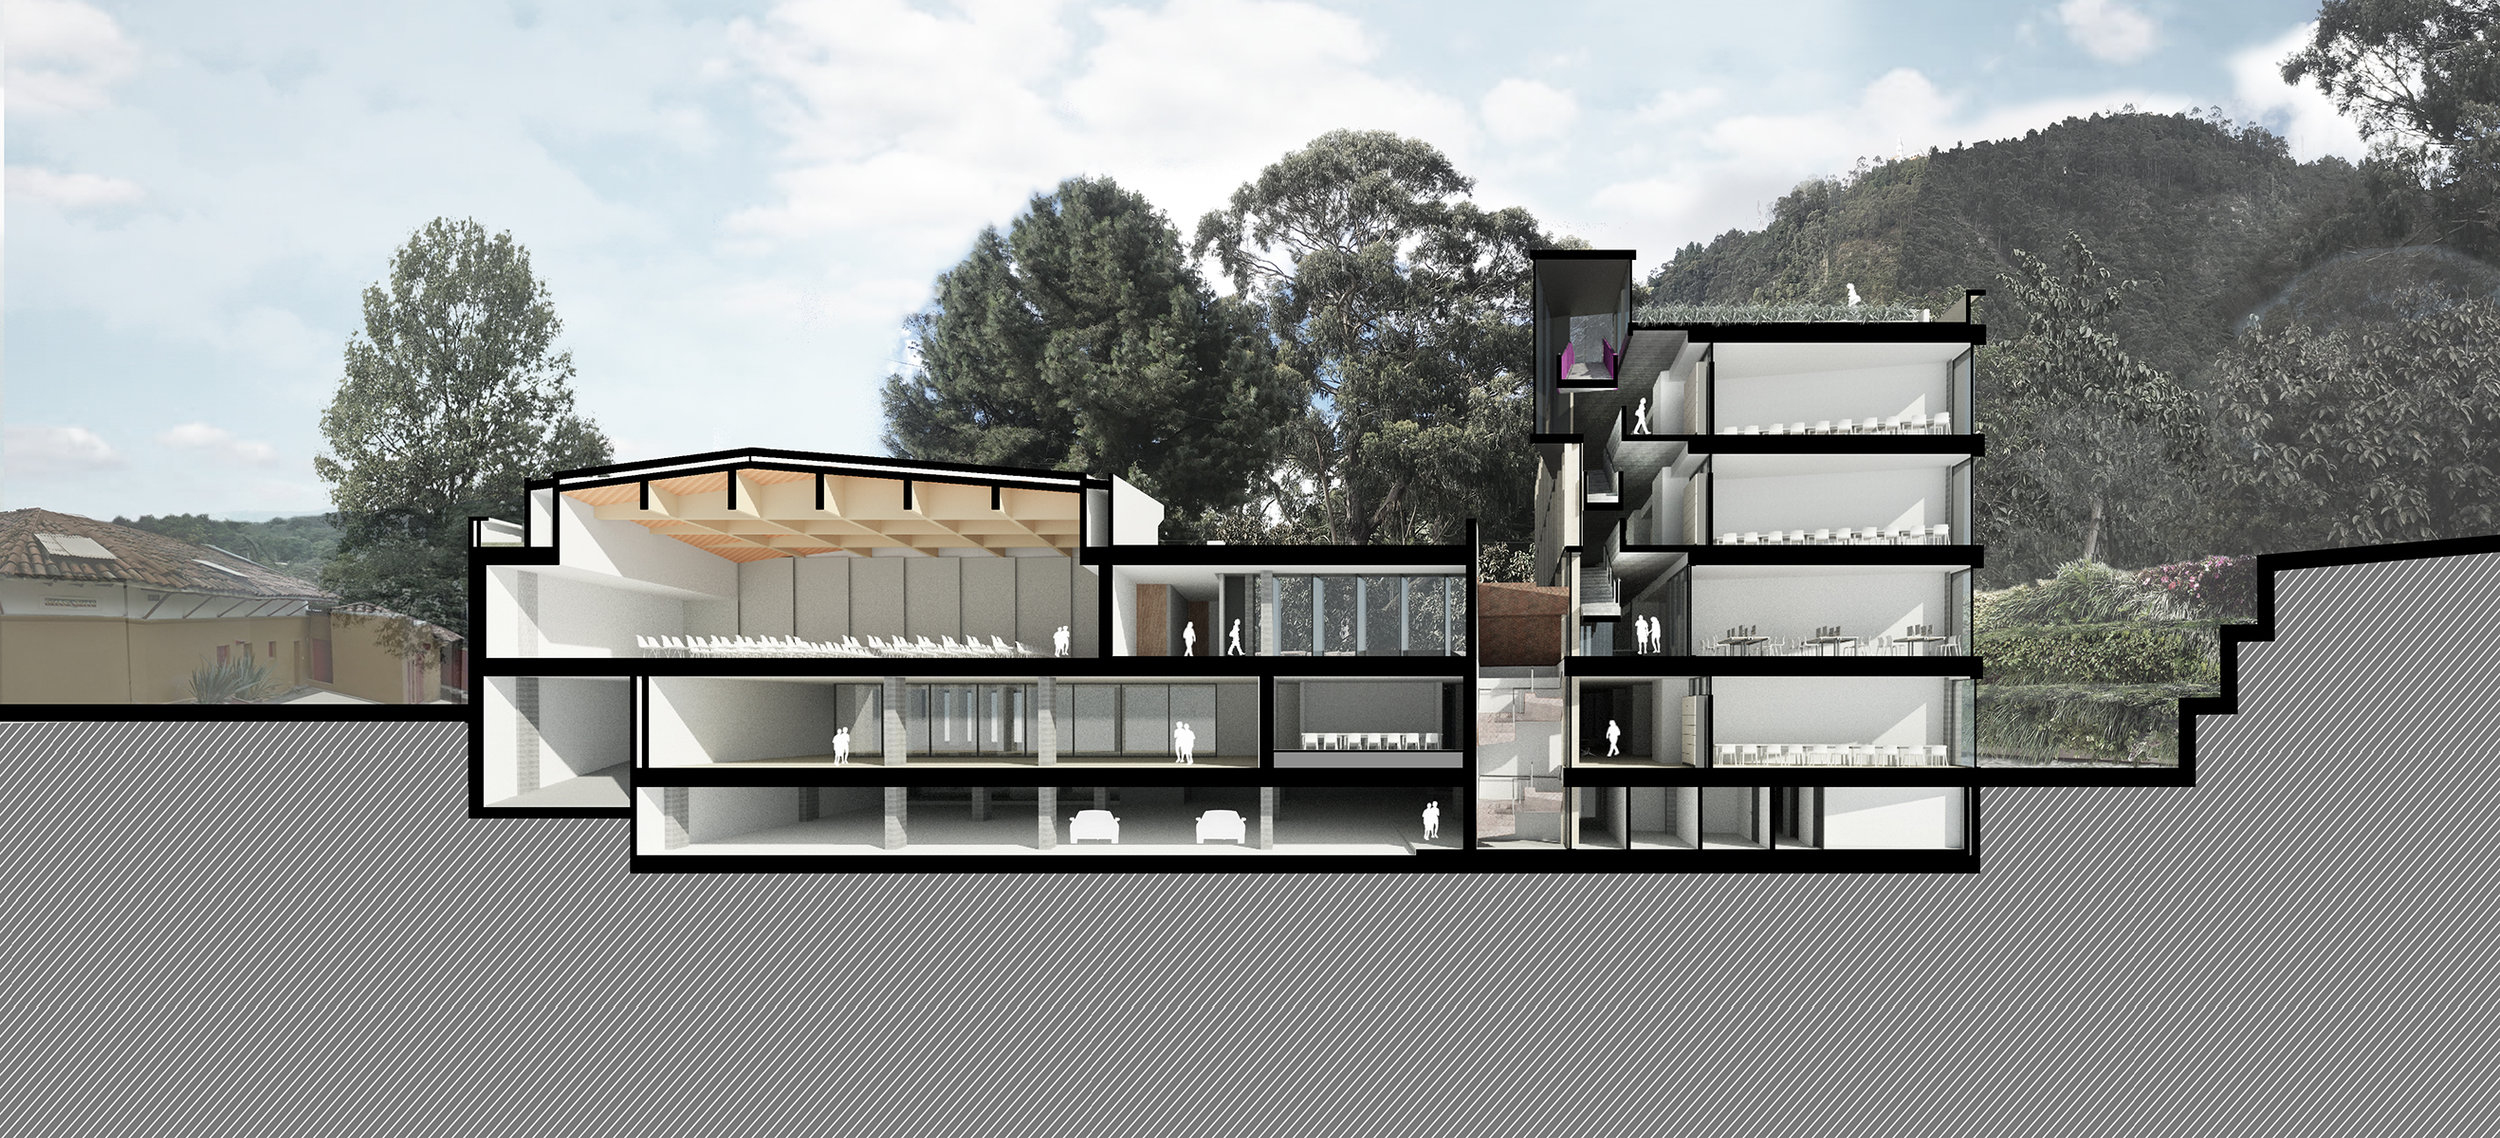 rir-arquitectos-uniandes-bolivariana-14.jpg